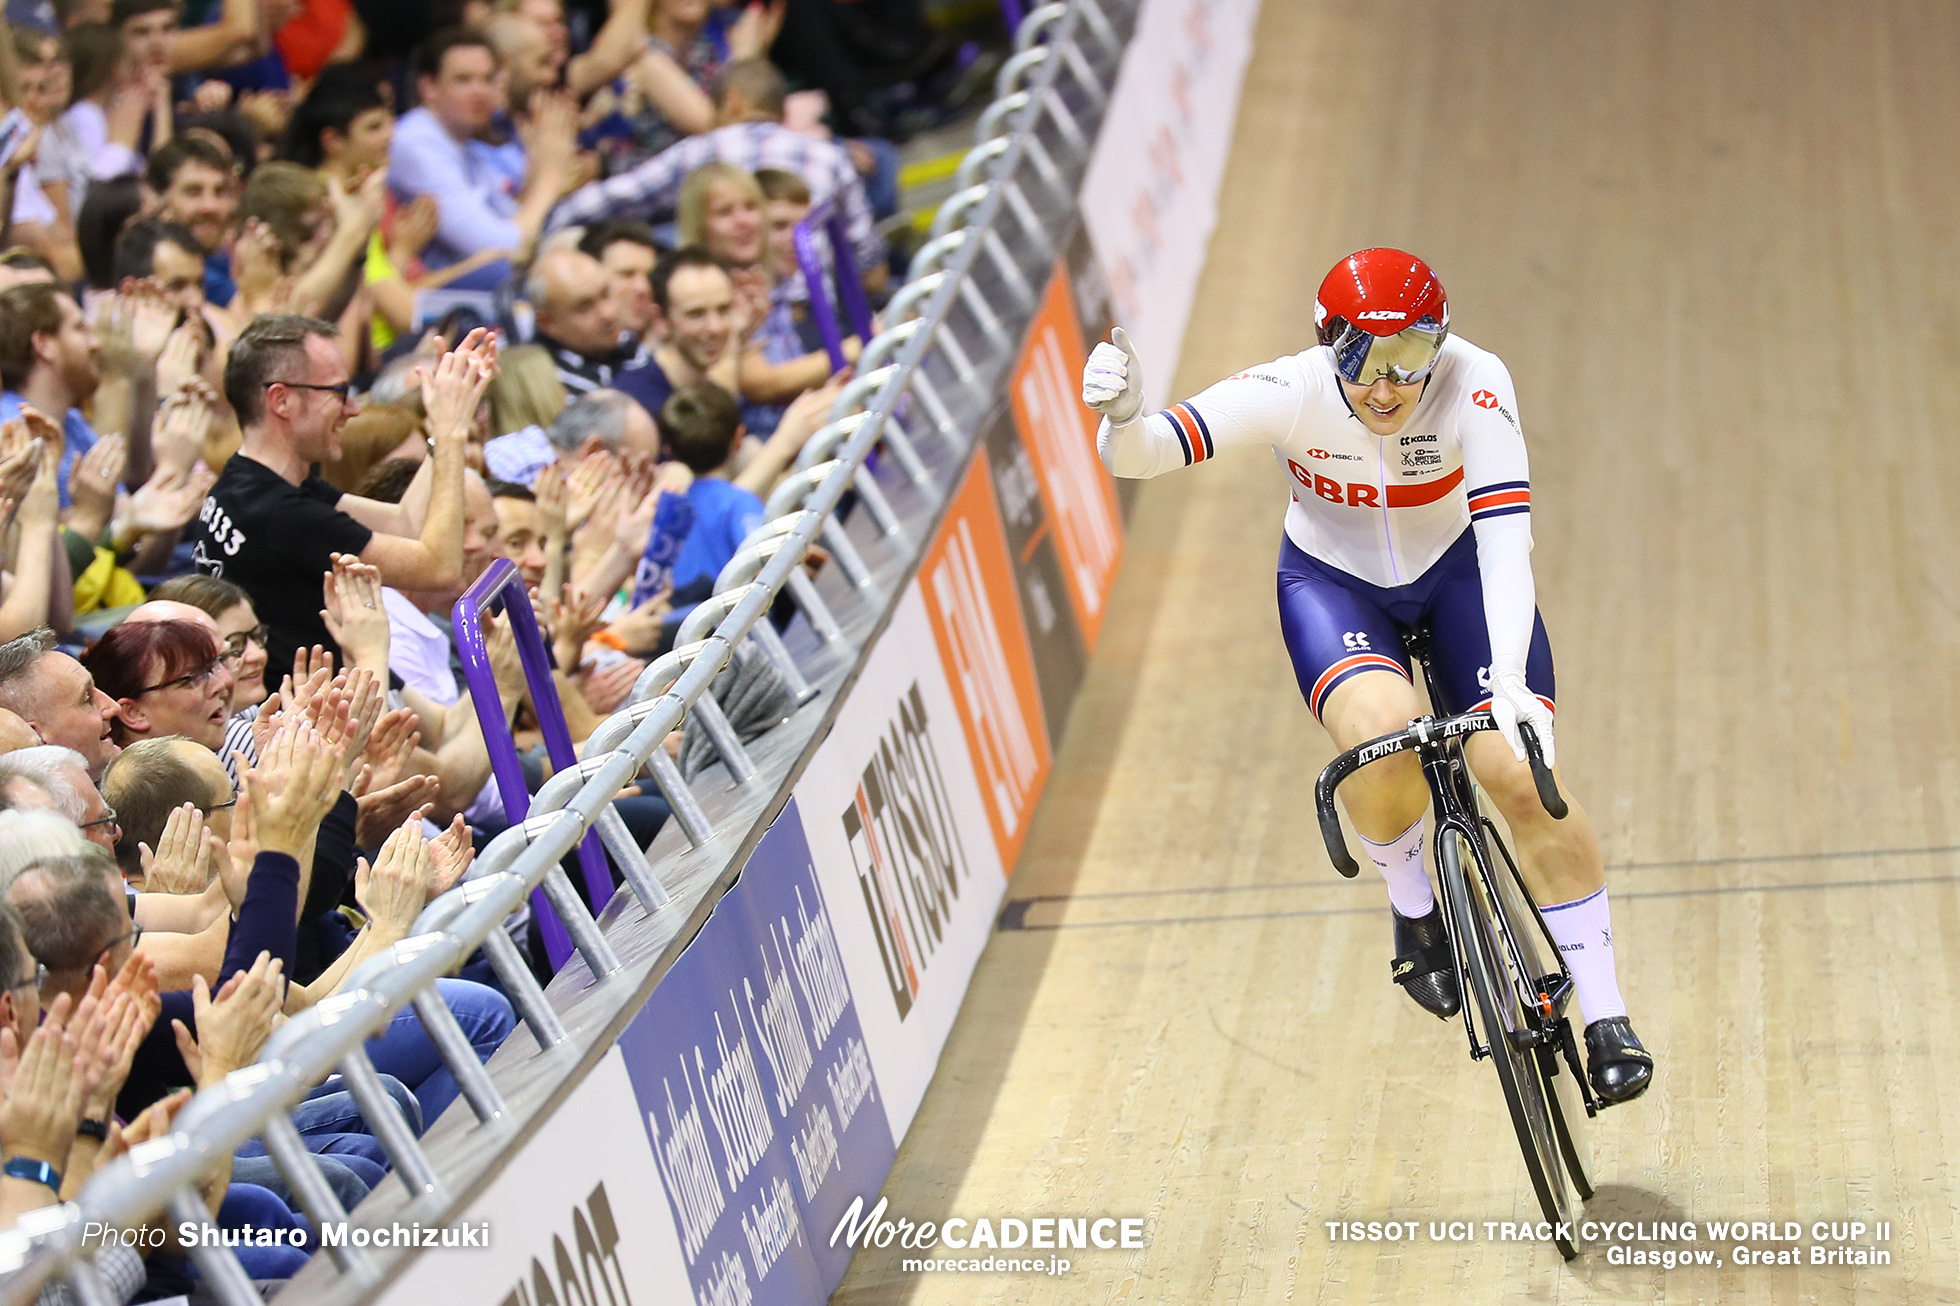 Final / Women's Keirin / TISSOT UCI TRACK CYCLING WORLD CUP II, Glasgow, Great Britain, Katy MARCHANT ケイティー・マーシャン